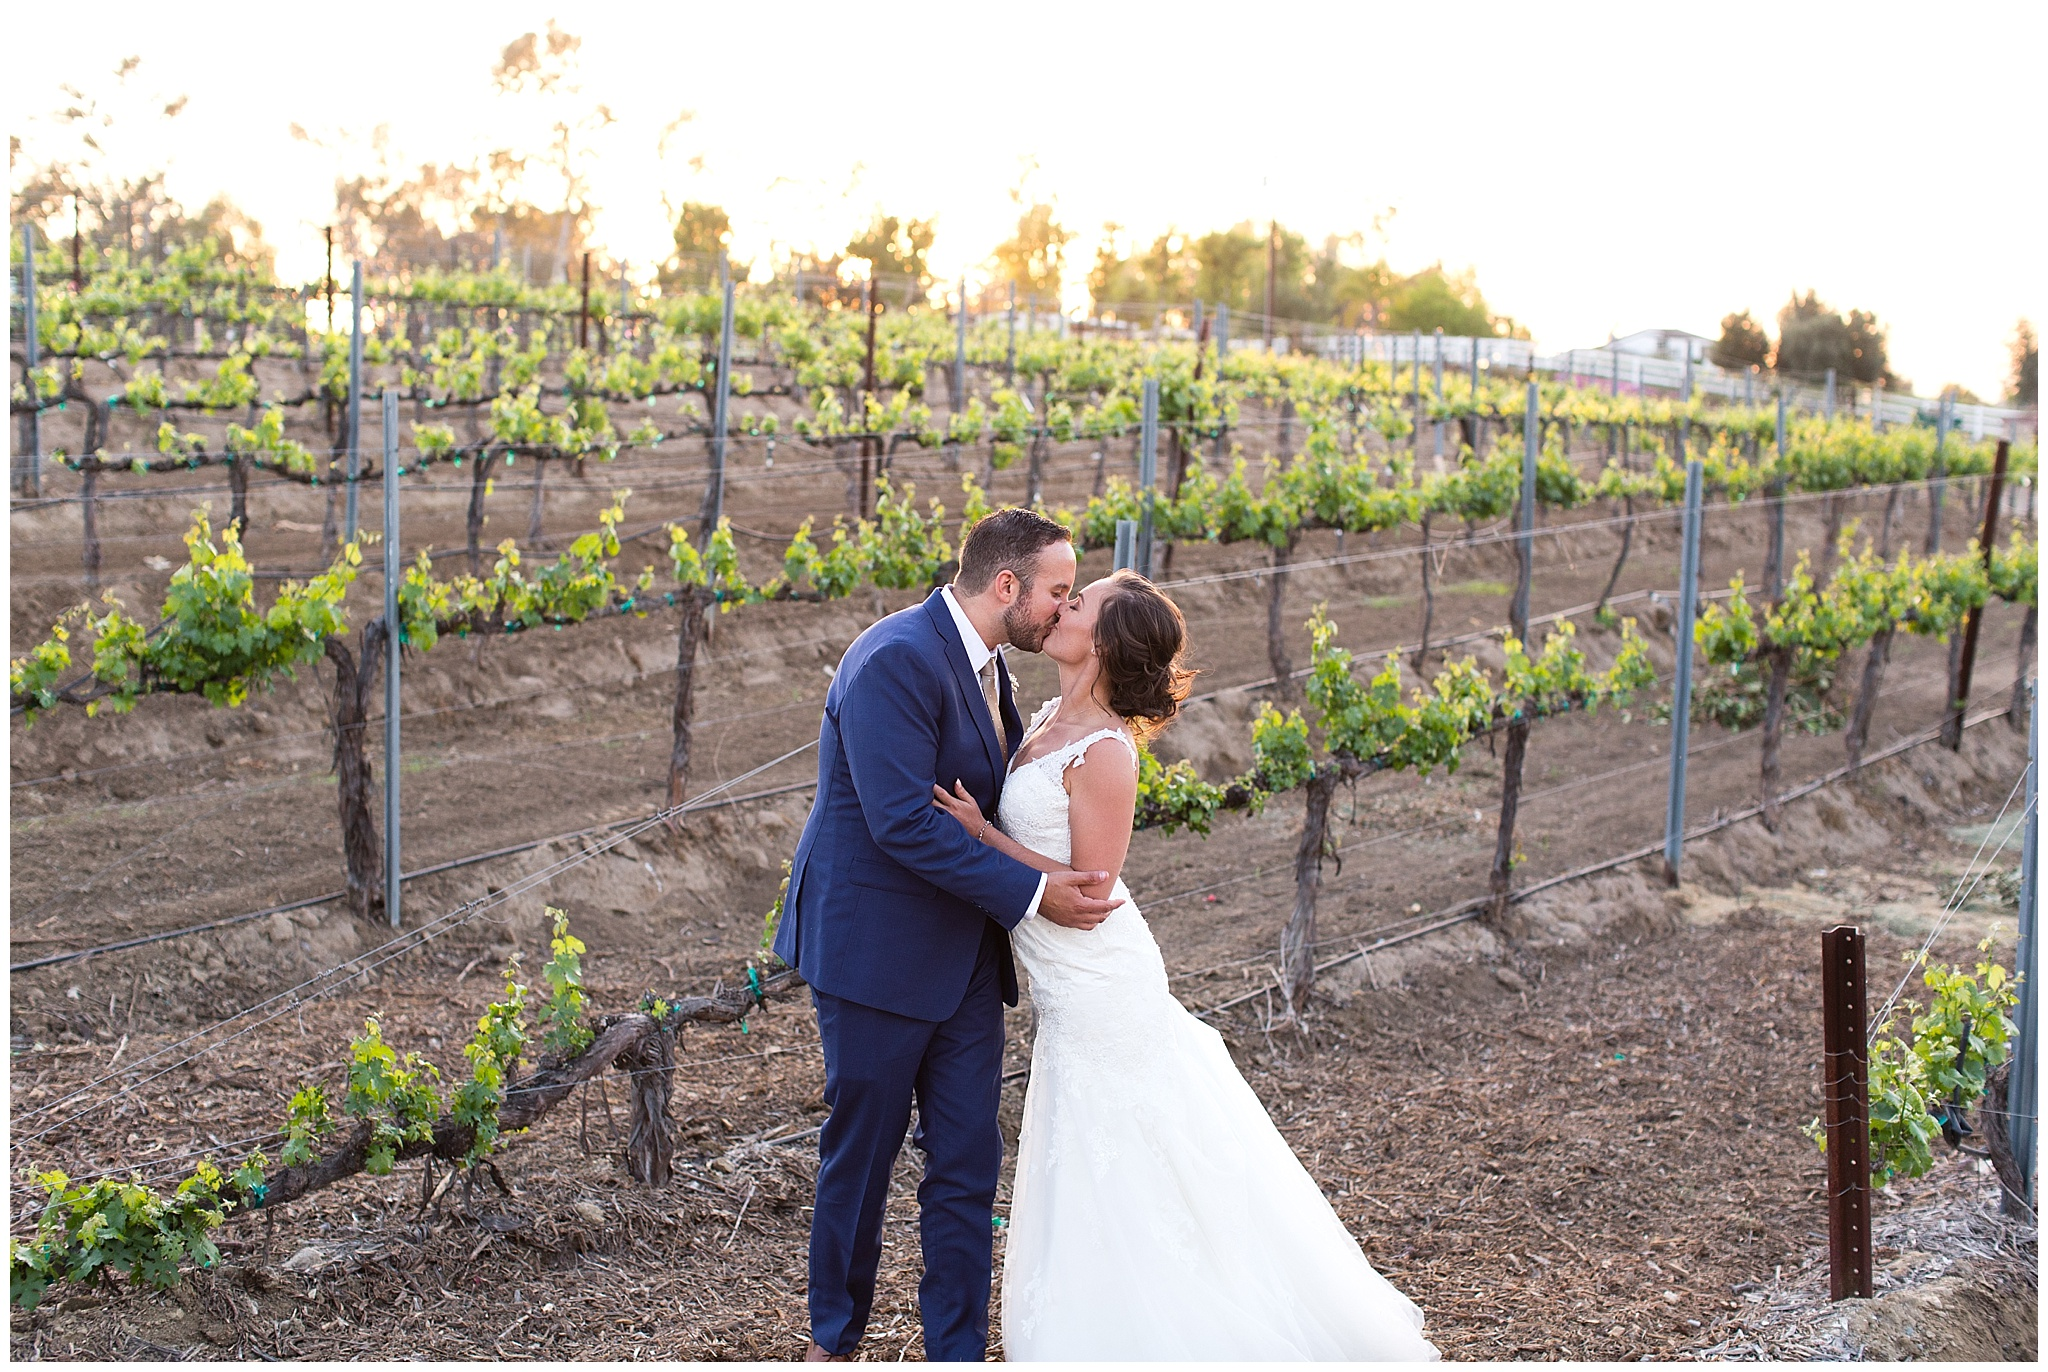 Vinny-Cayt-Wedding-04-26-18-1734.jpg